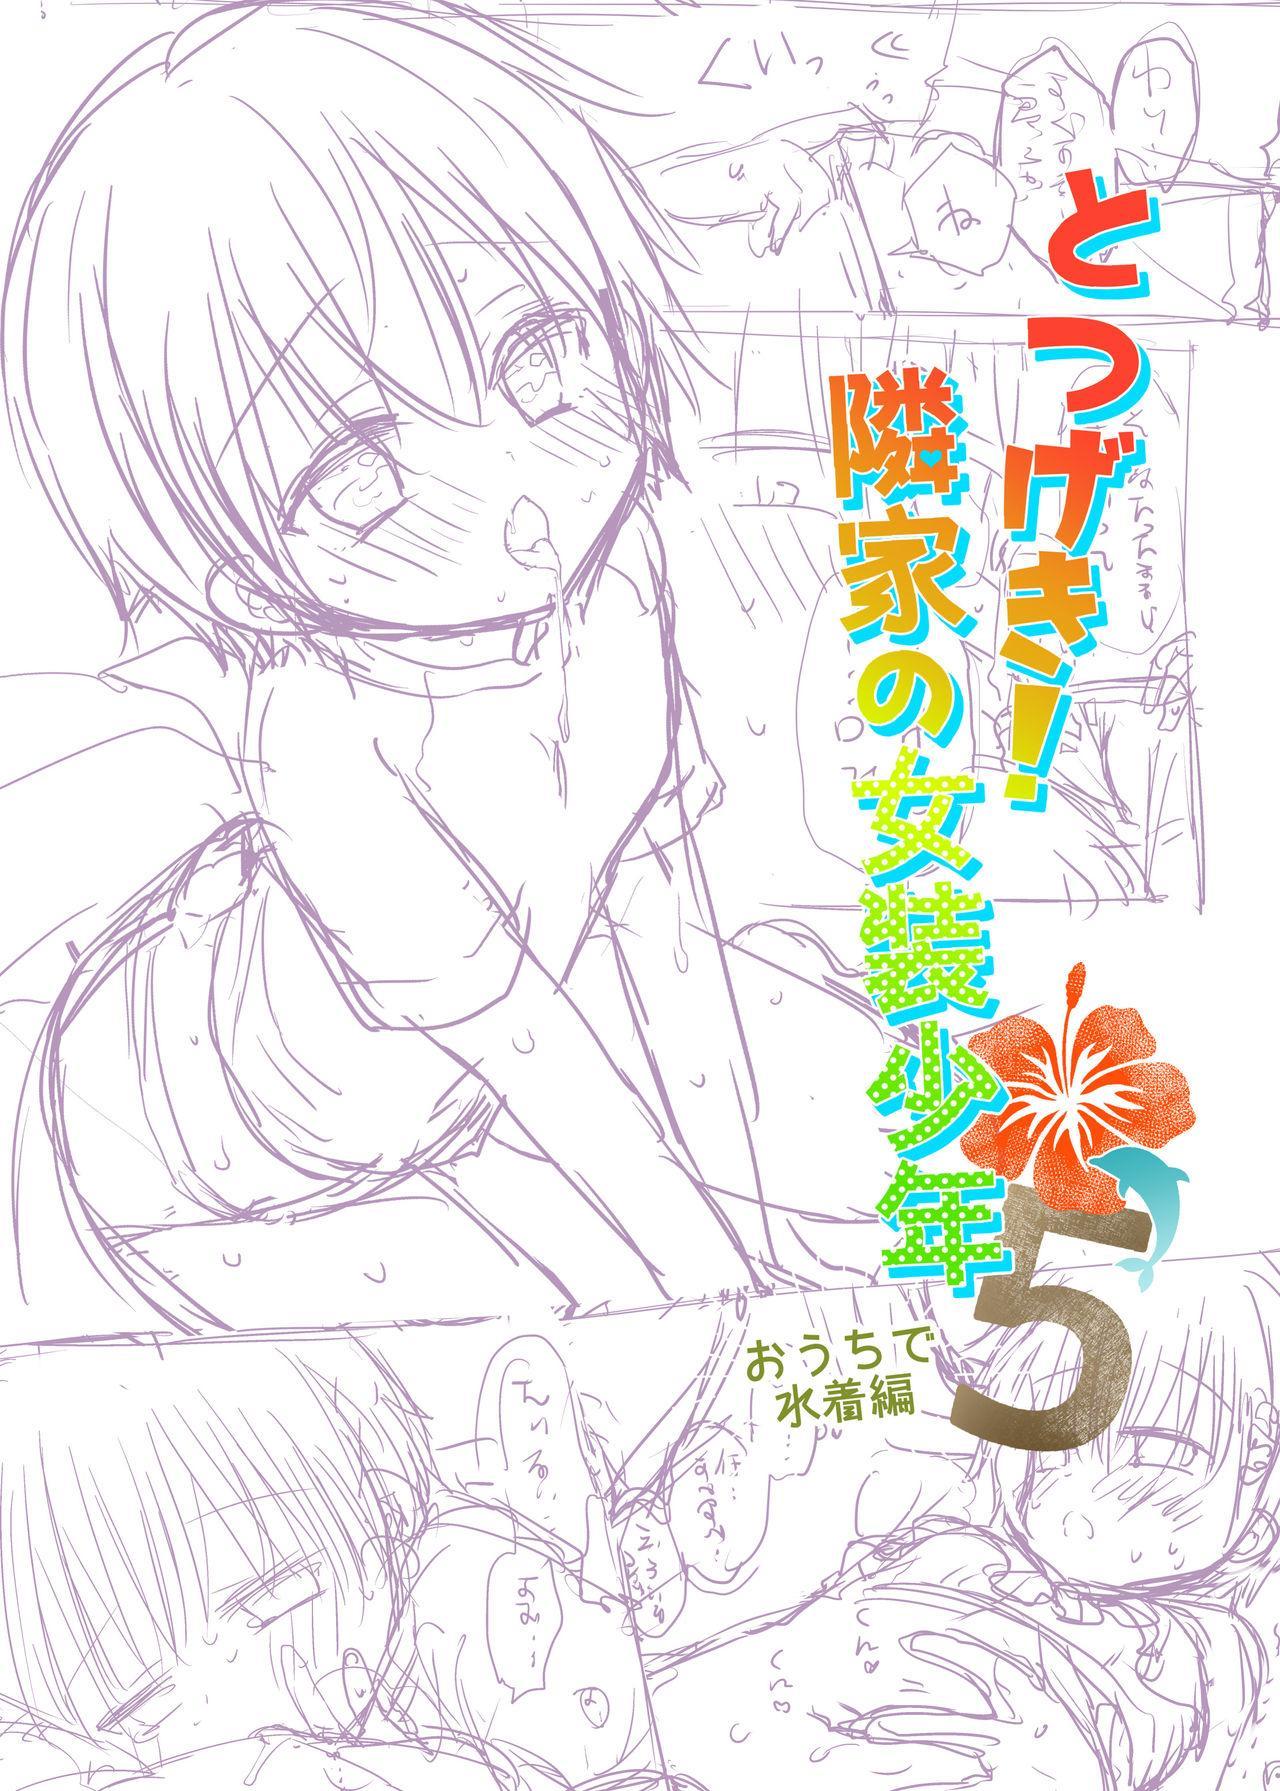 Totsugeki! Rinka no Josou Shounen 5 Ouchi de Mizugi Hen 2